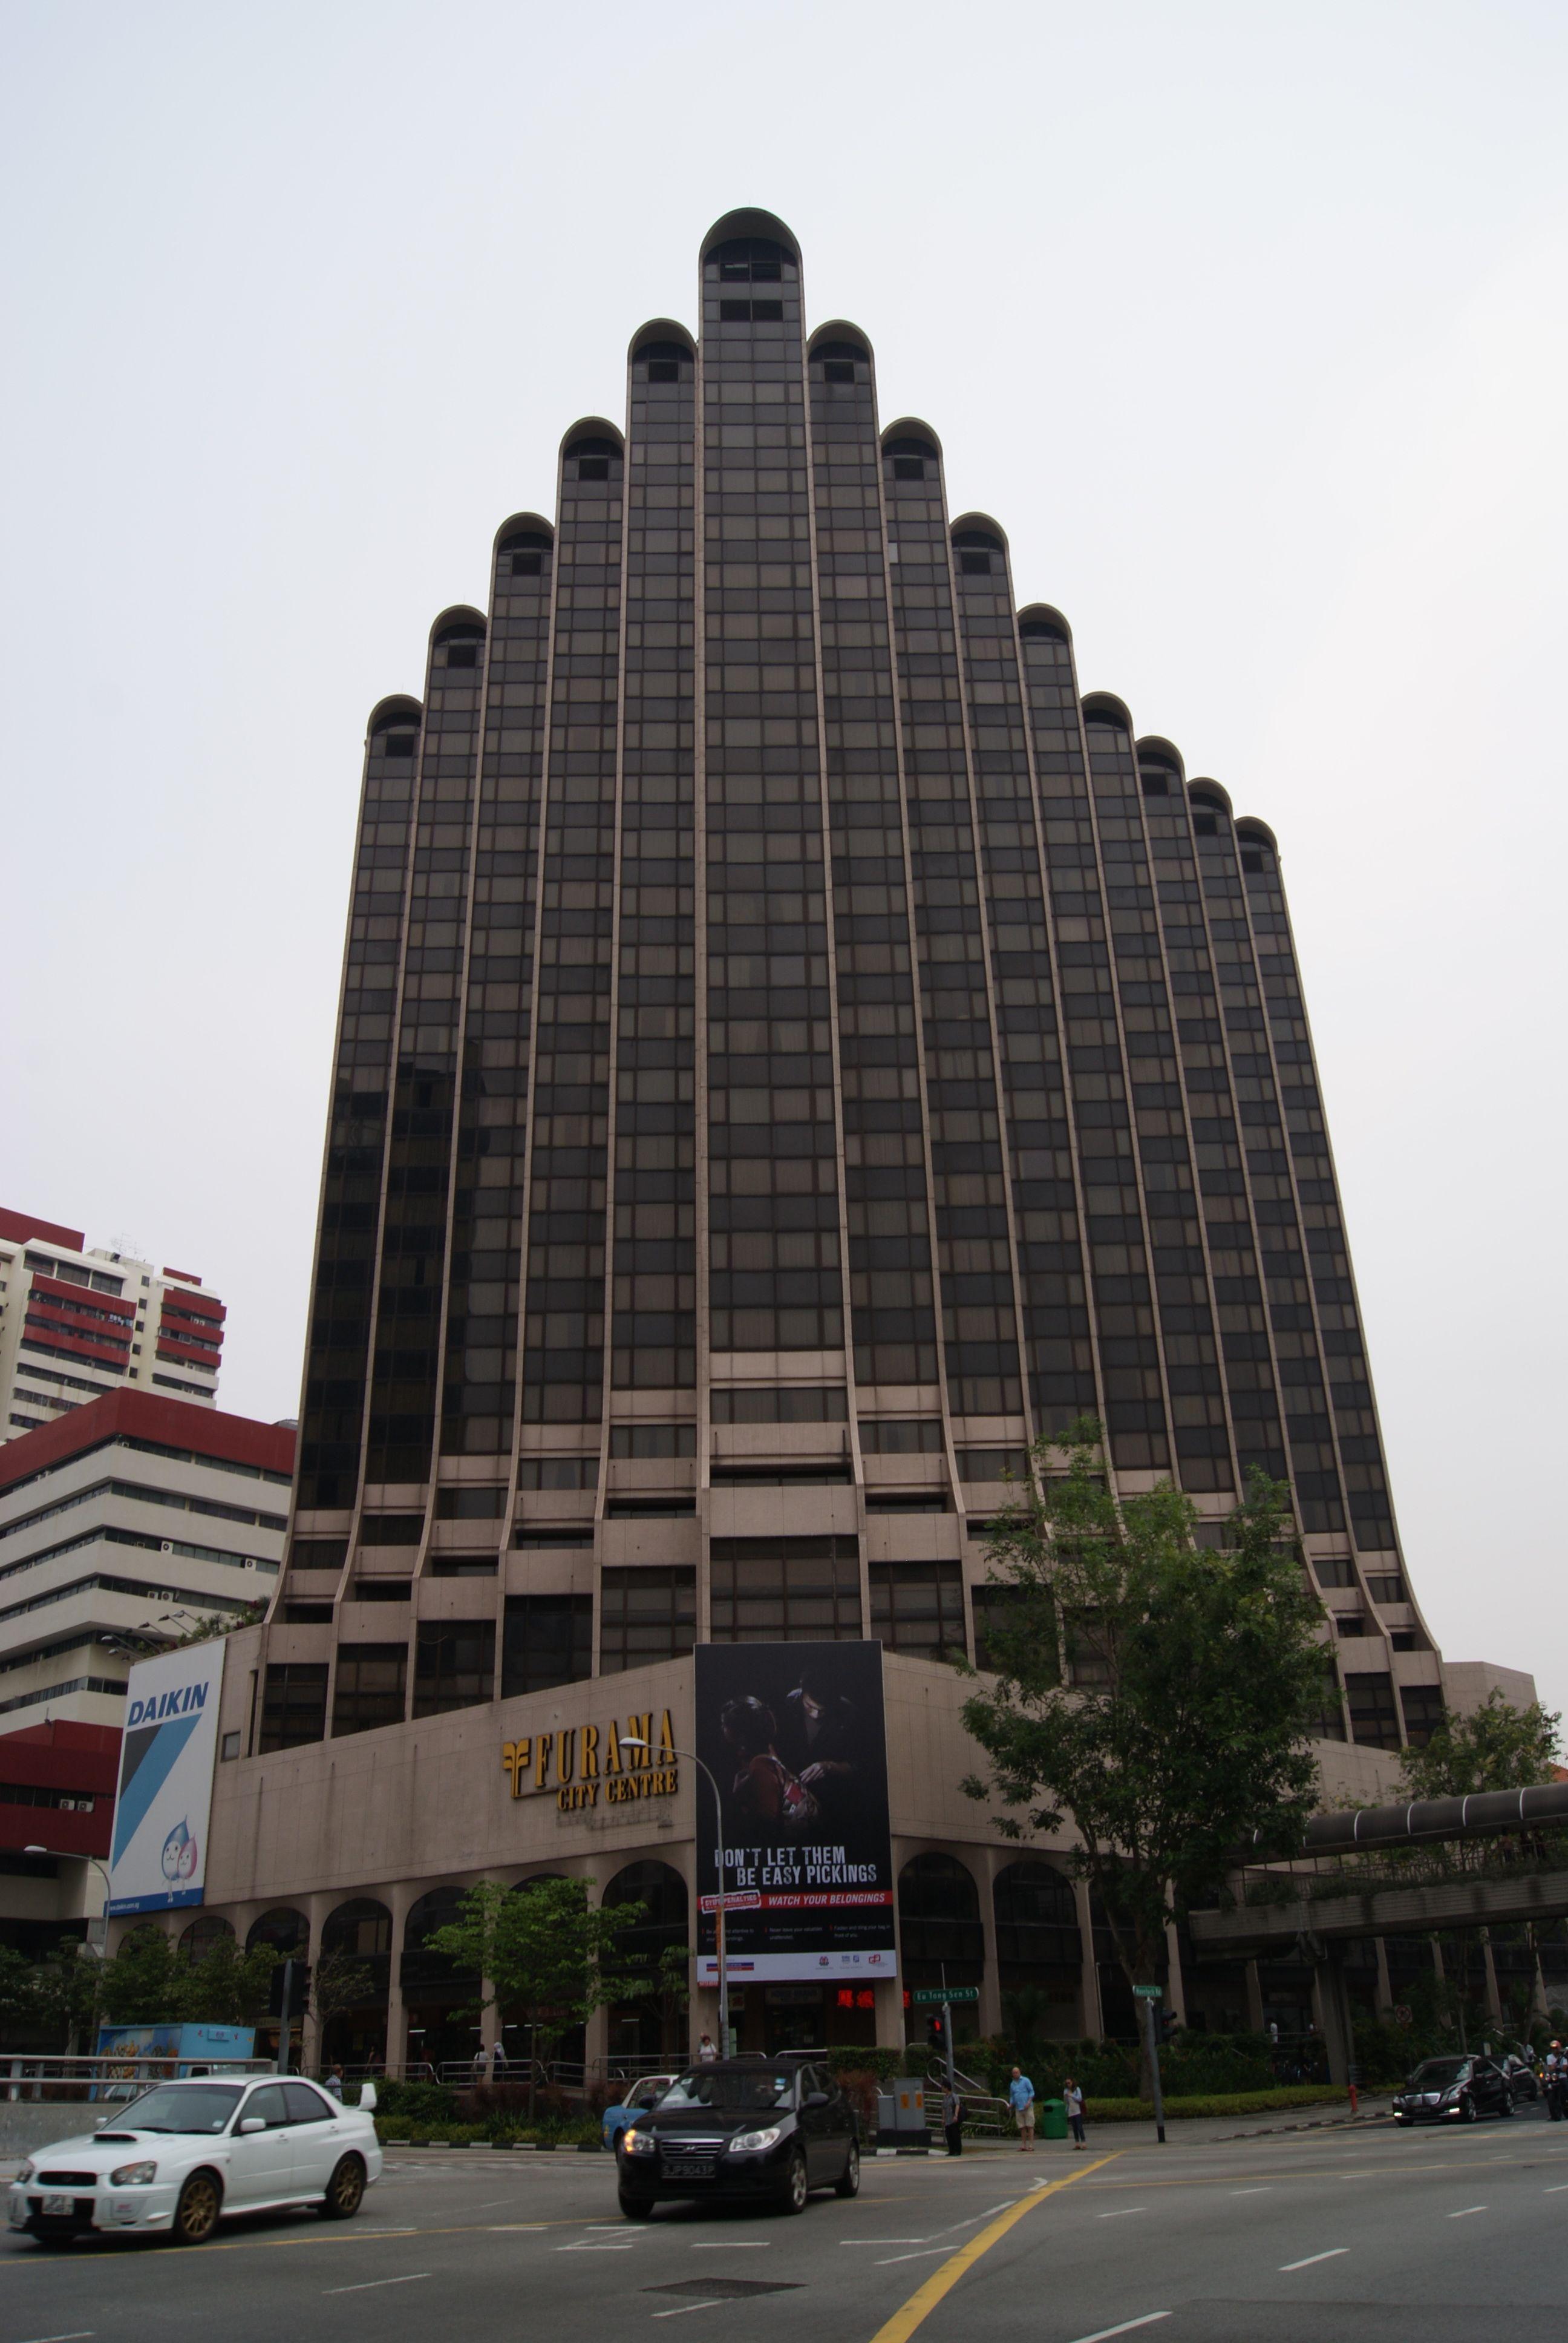 Furama City Centre Car Park Entrance